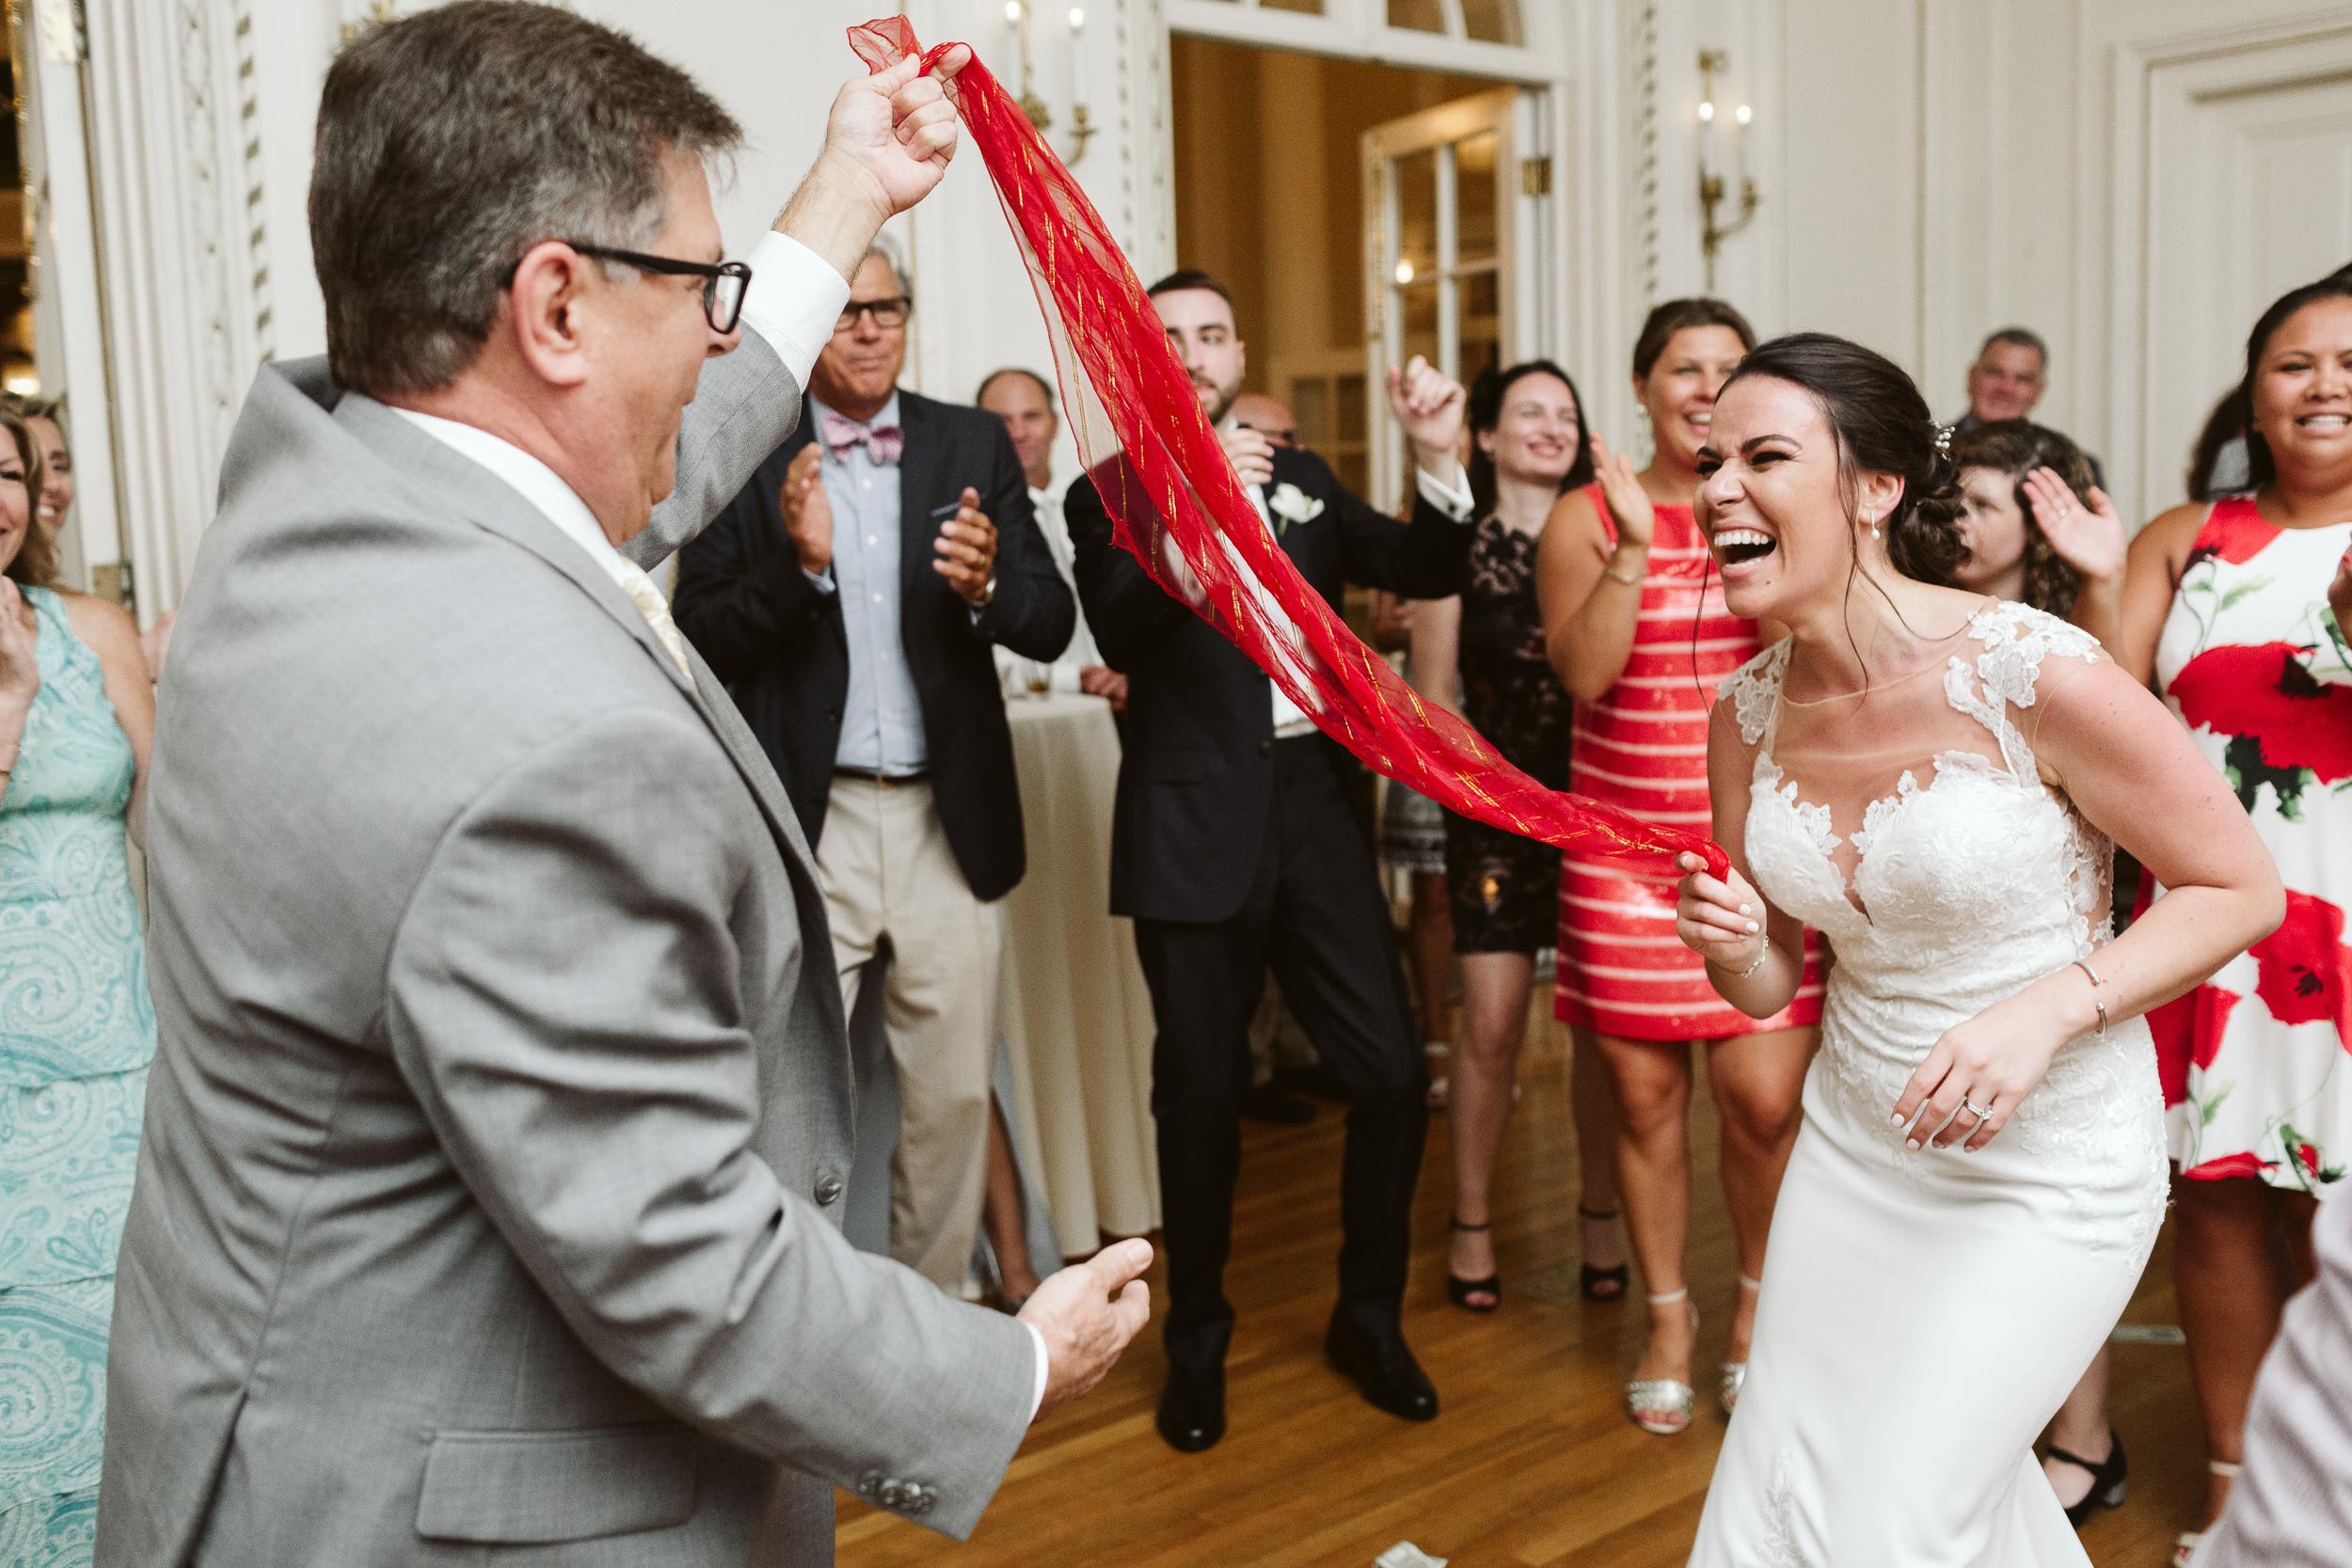 tupper-manor-wedding-photos-0040.JPG